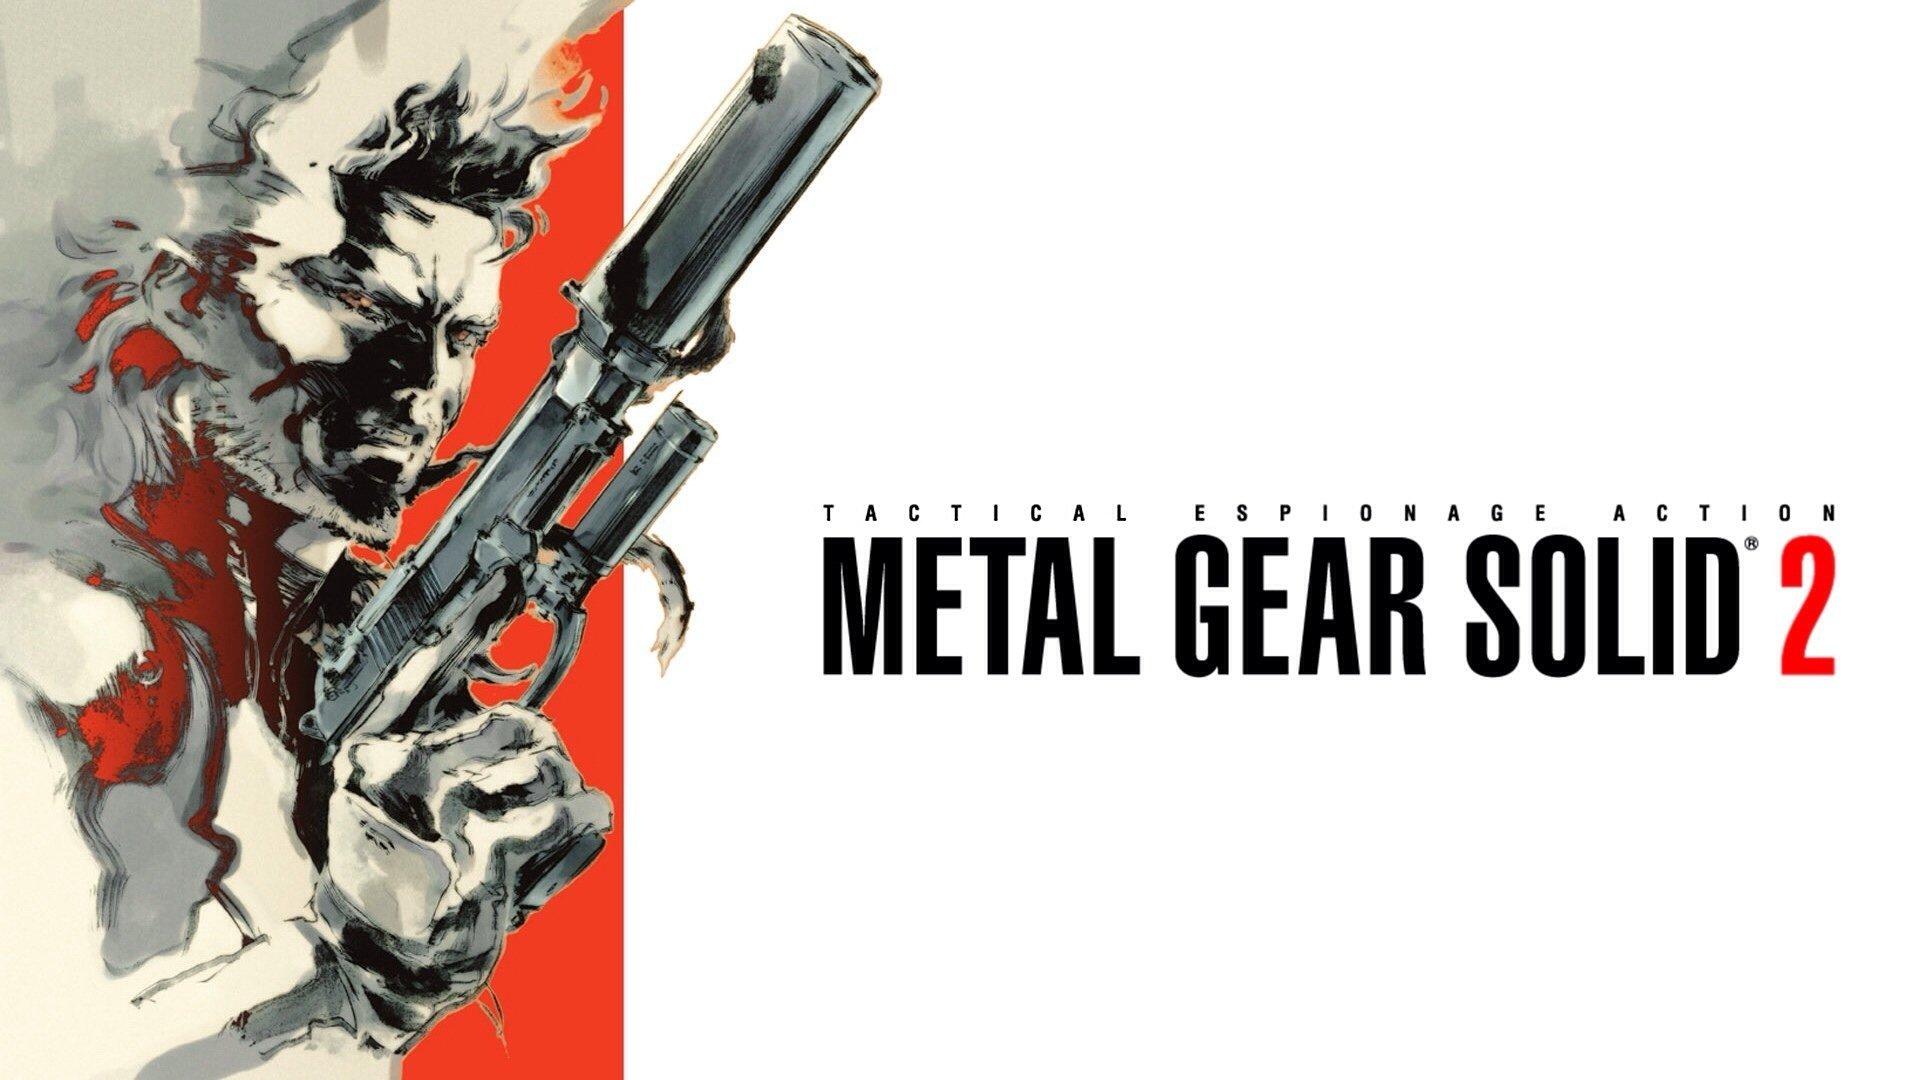 Metal Gear Solid 2 Wallpaper: Metal Gear Solid 2: Sons Of Liberty HD Wallpaper